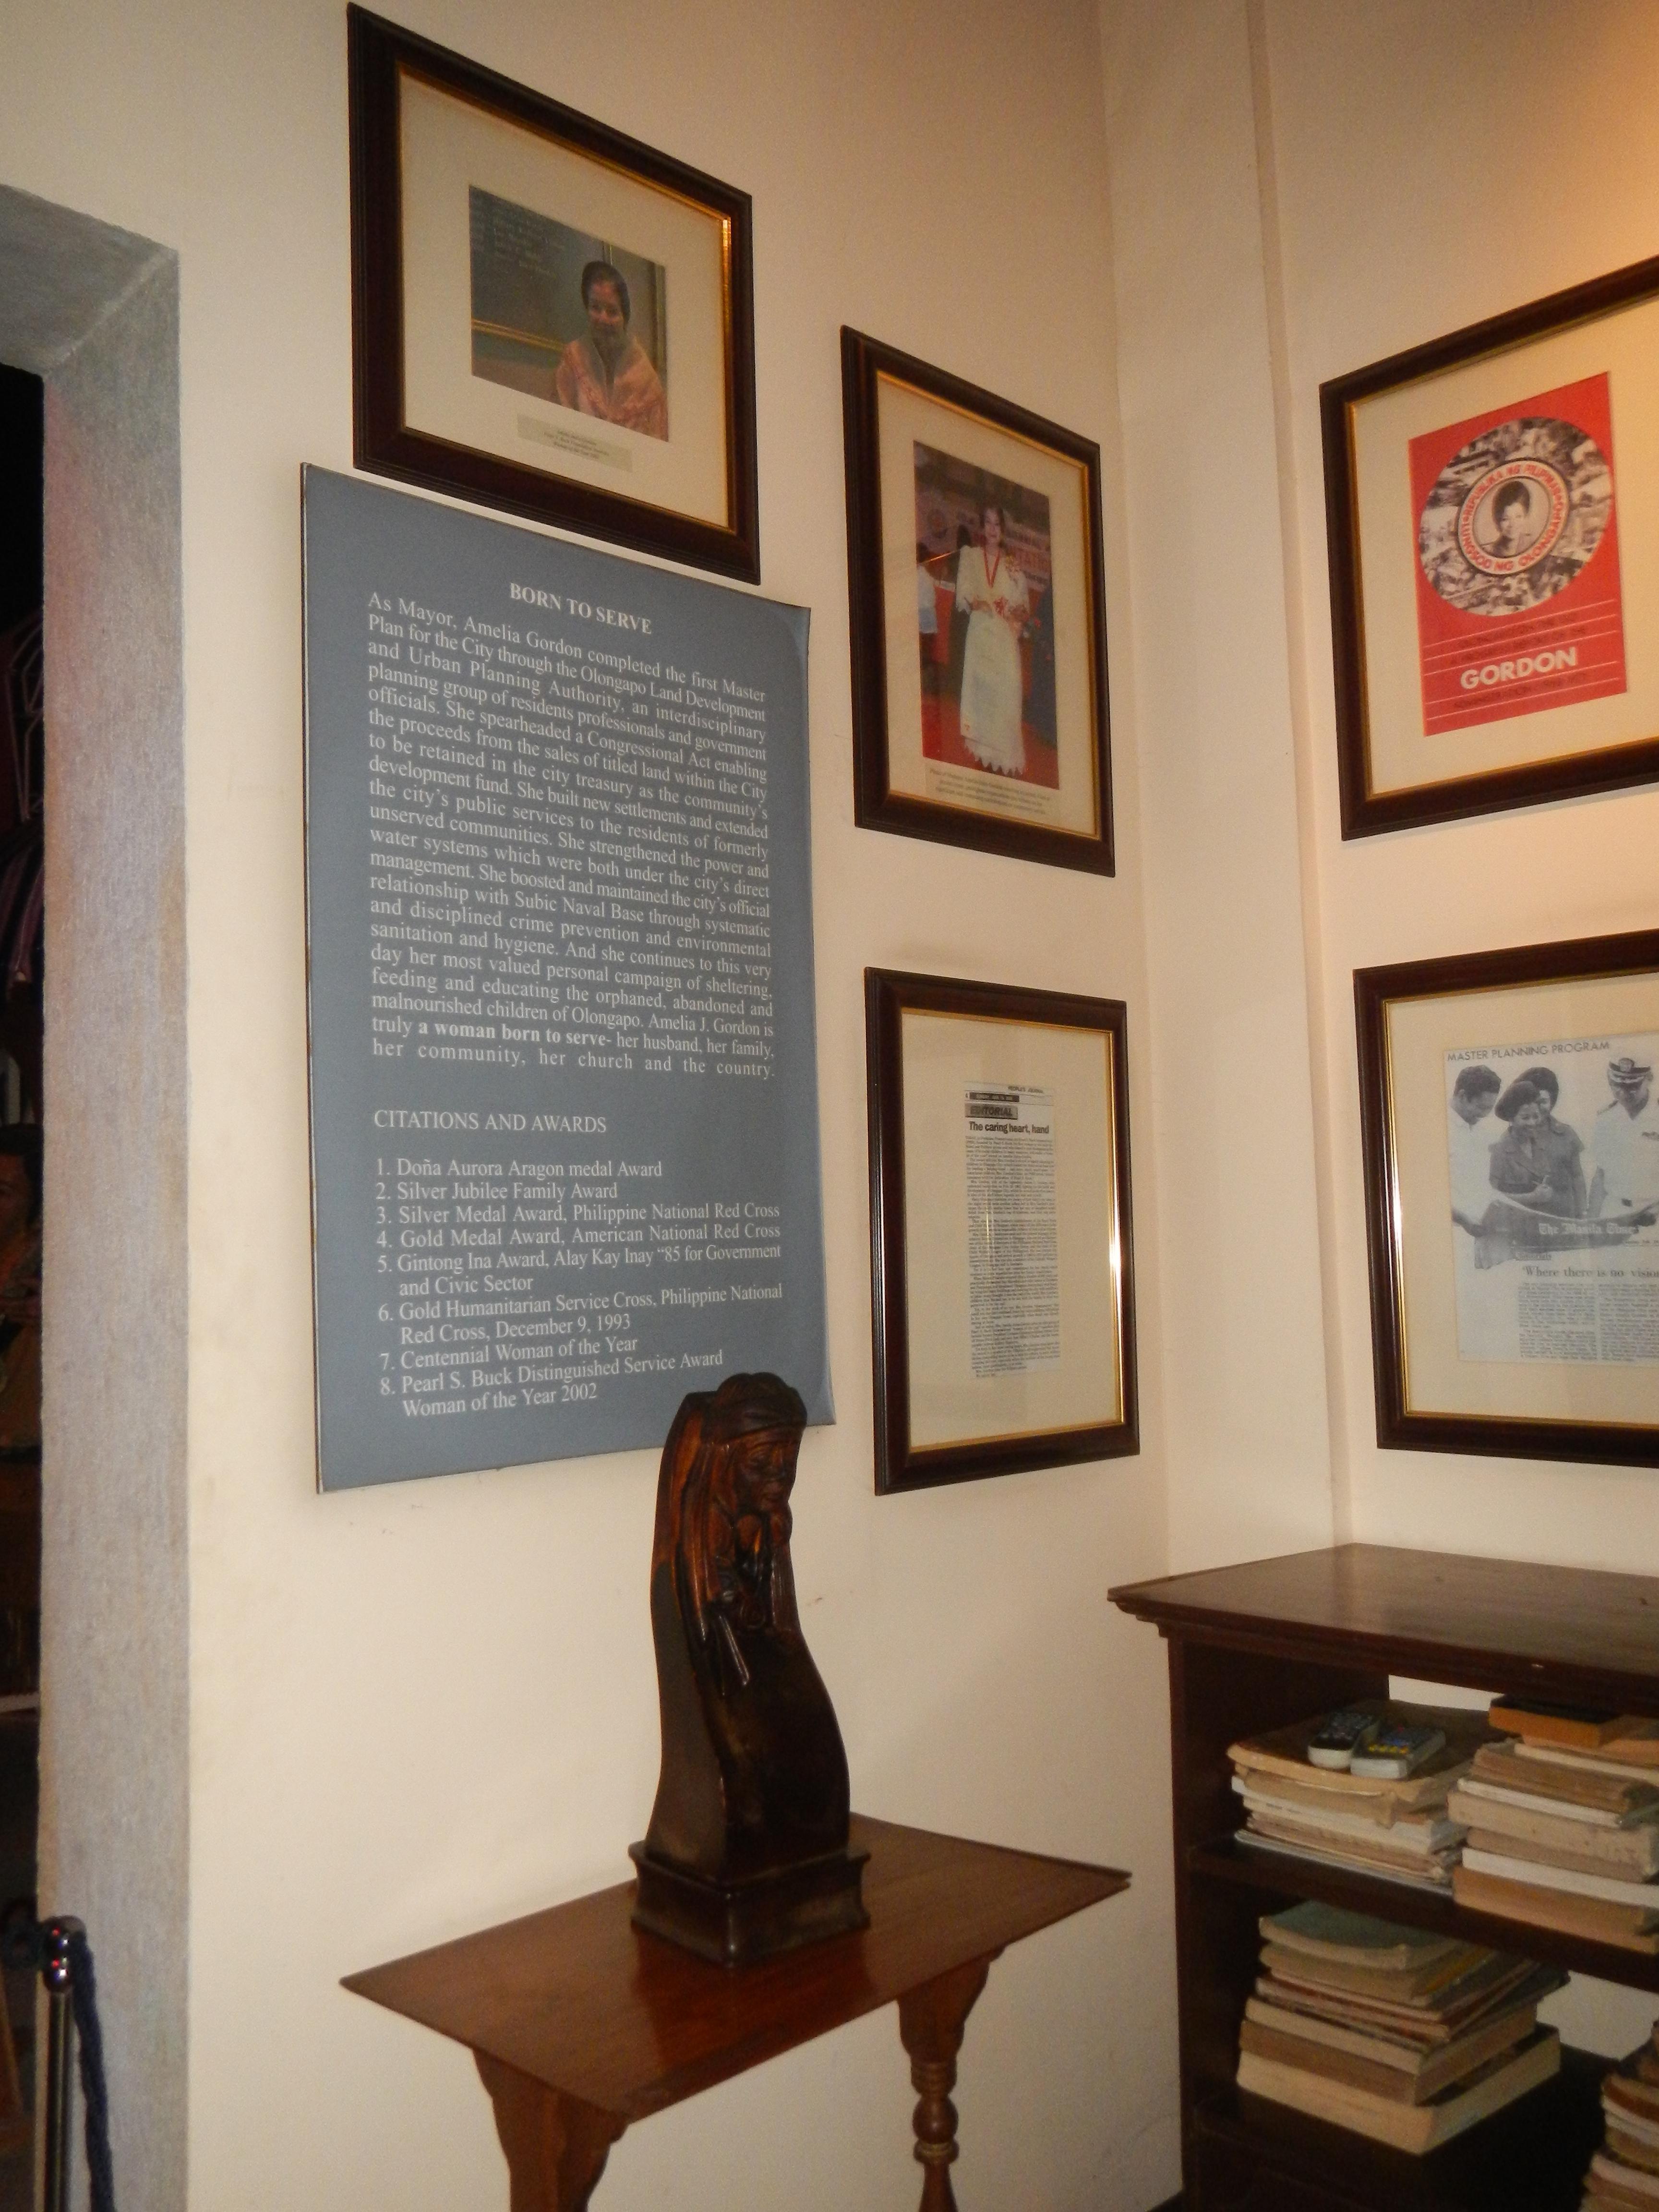 File:09724jfEast Bajac-bajac Gordon Museum Landmarks